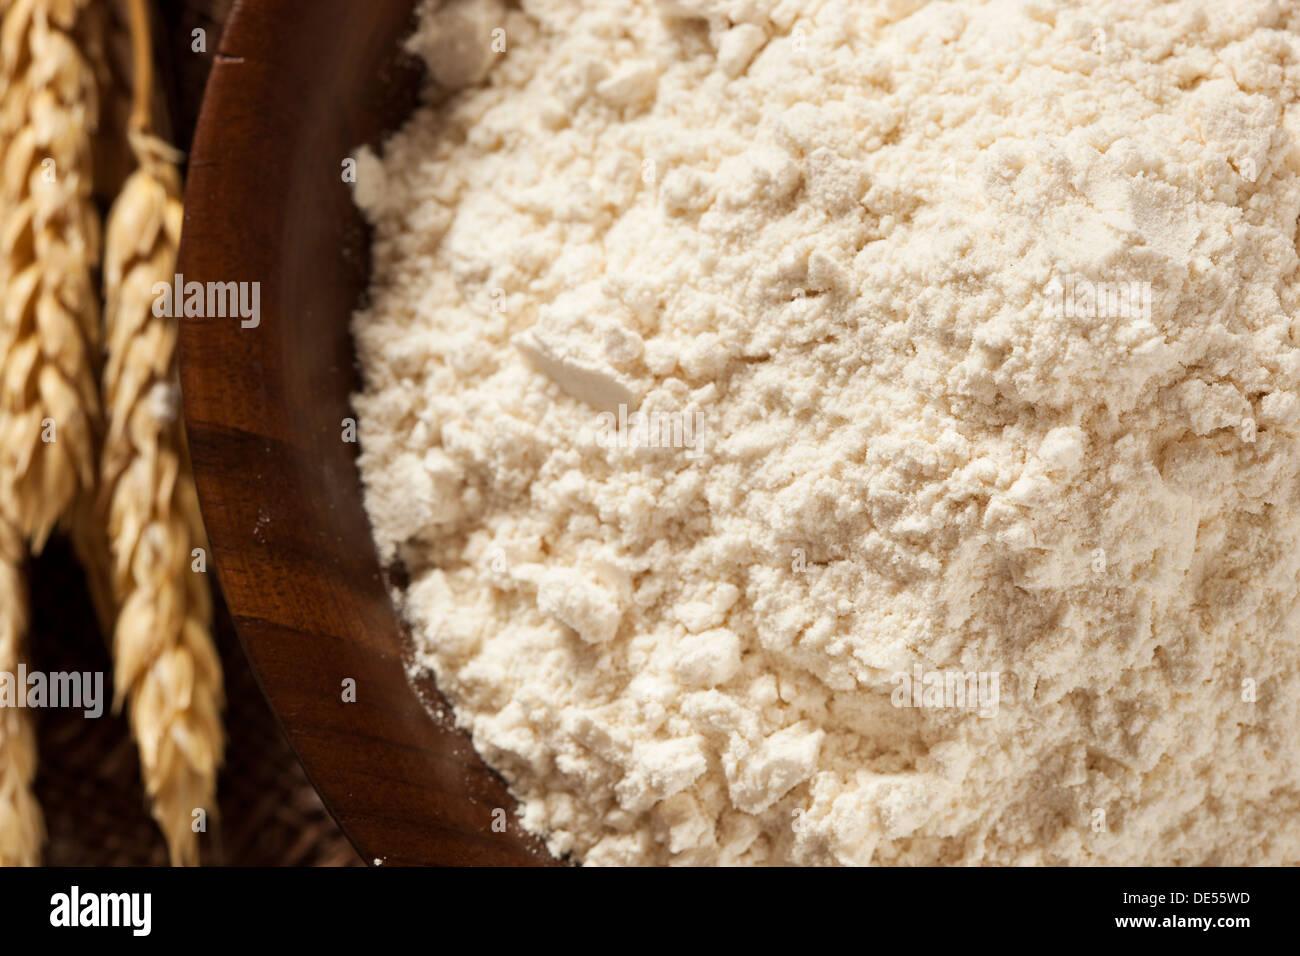 Organic Whole Wheat Flour Ready For Baking - Stock Image